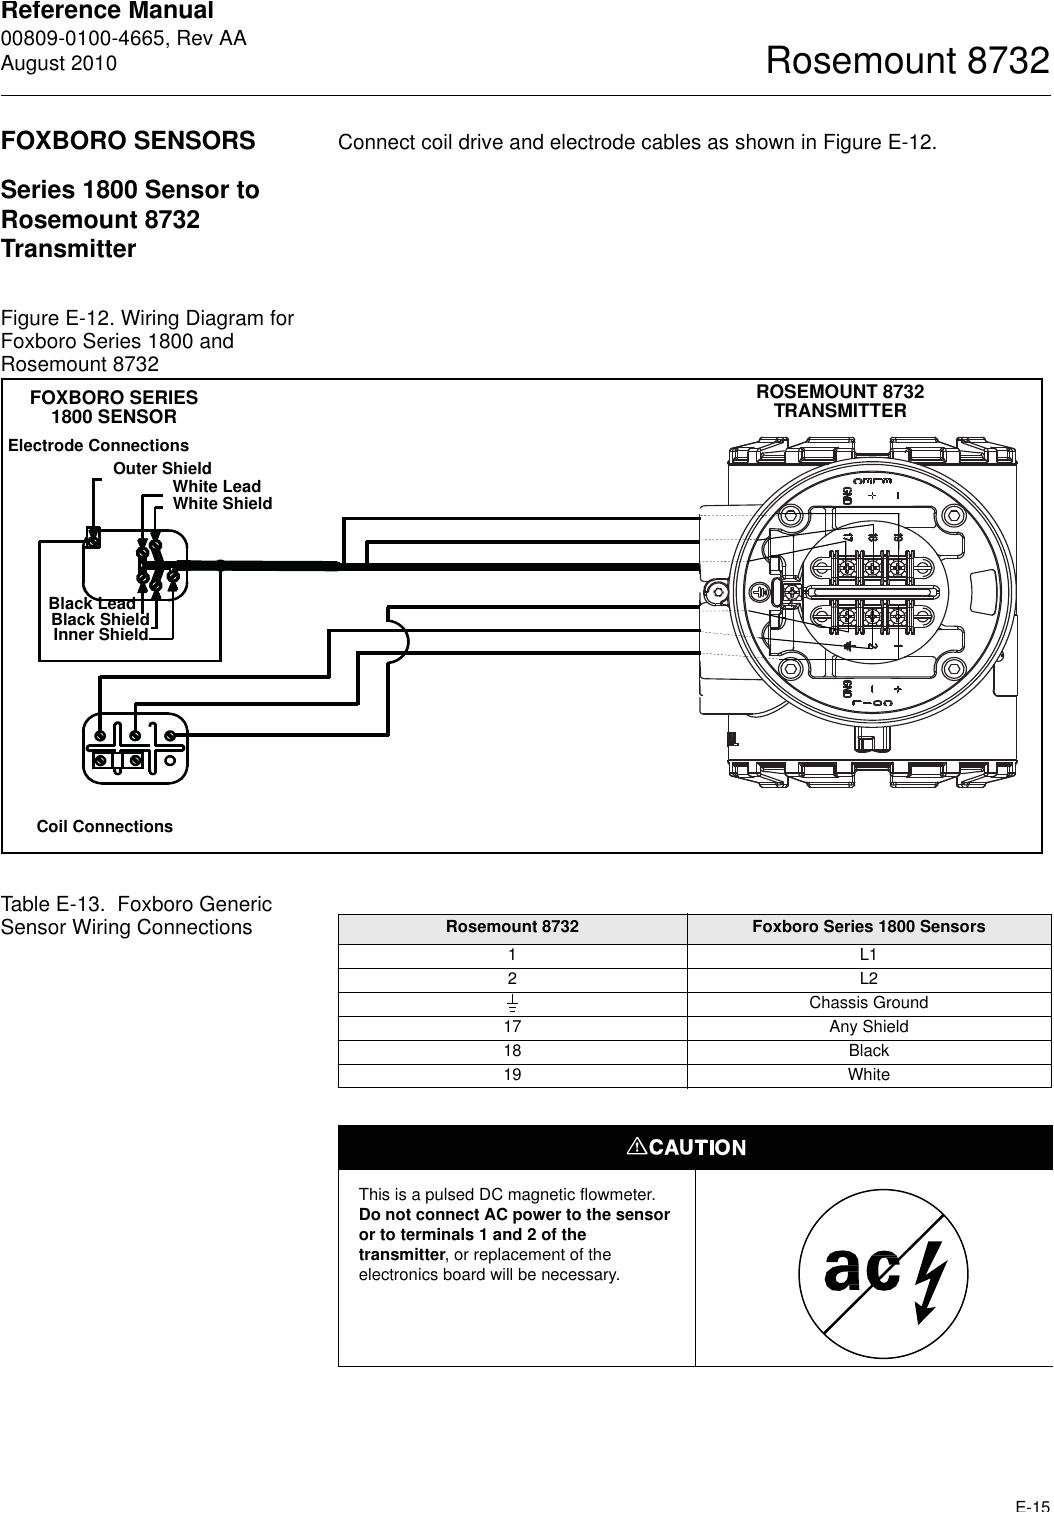 emersonrosemount8732usersmanual165675 30137492 user guide page 141 png